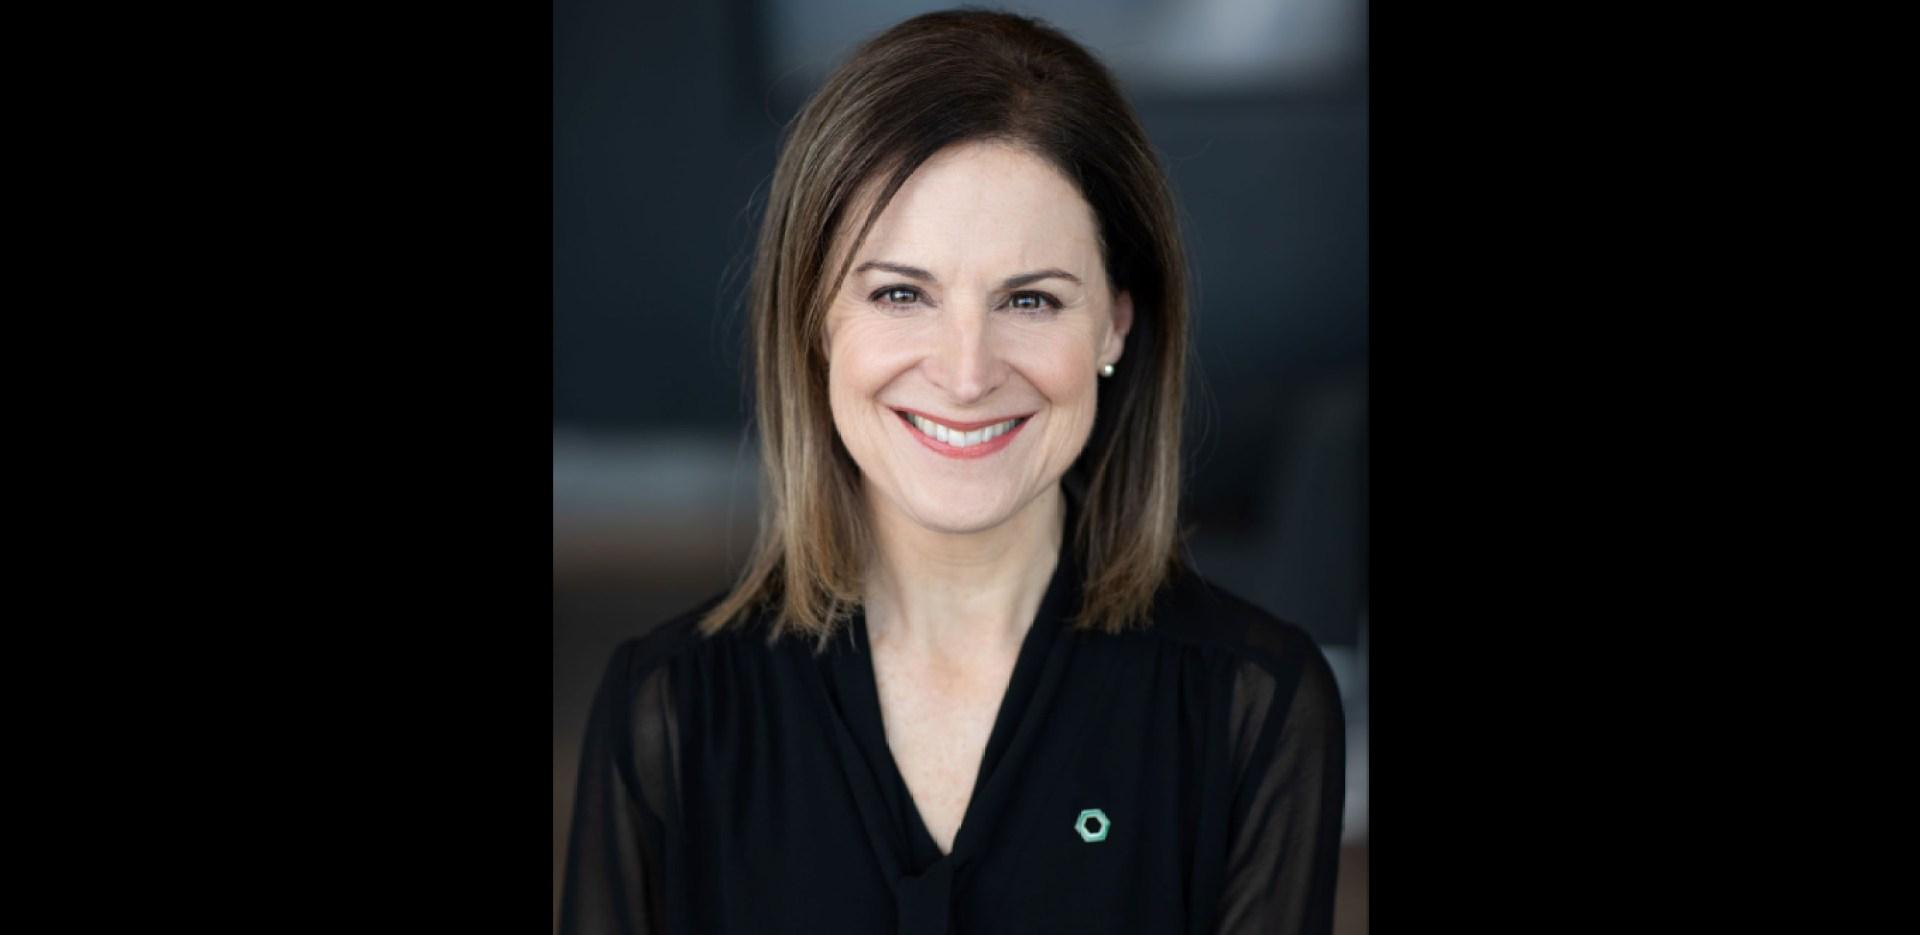 Marie-Huguette-Cormier-Headshot